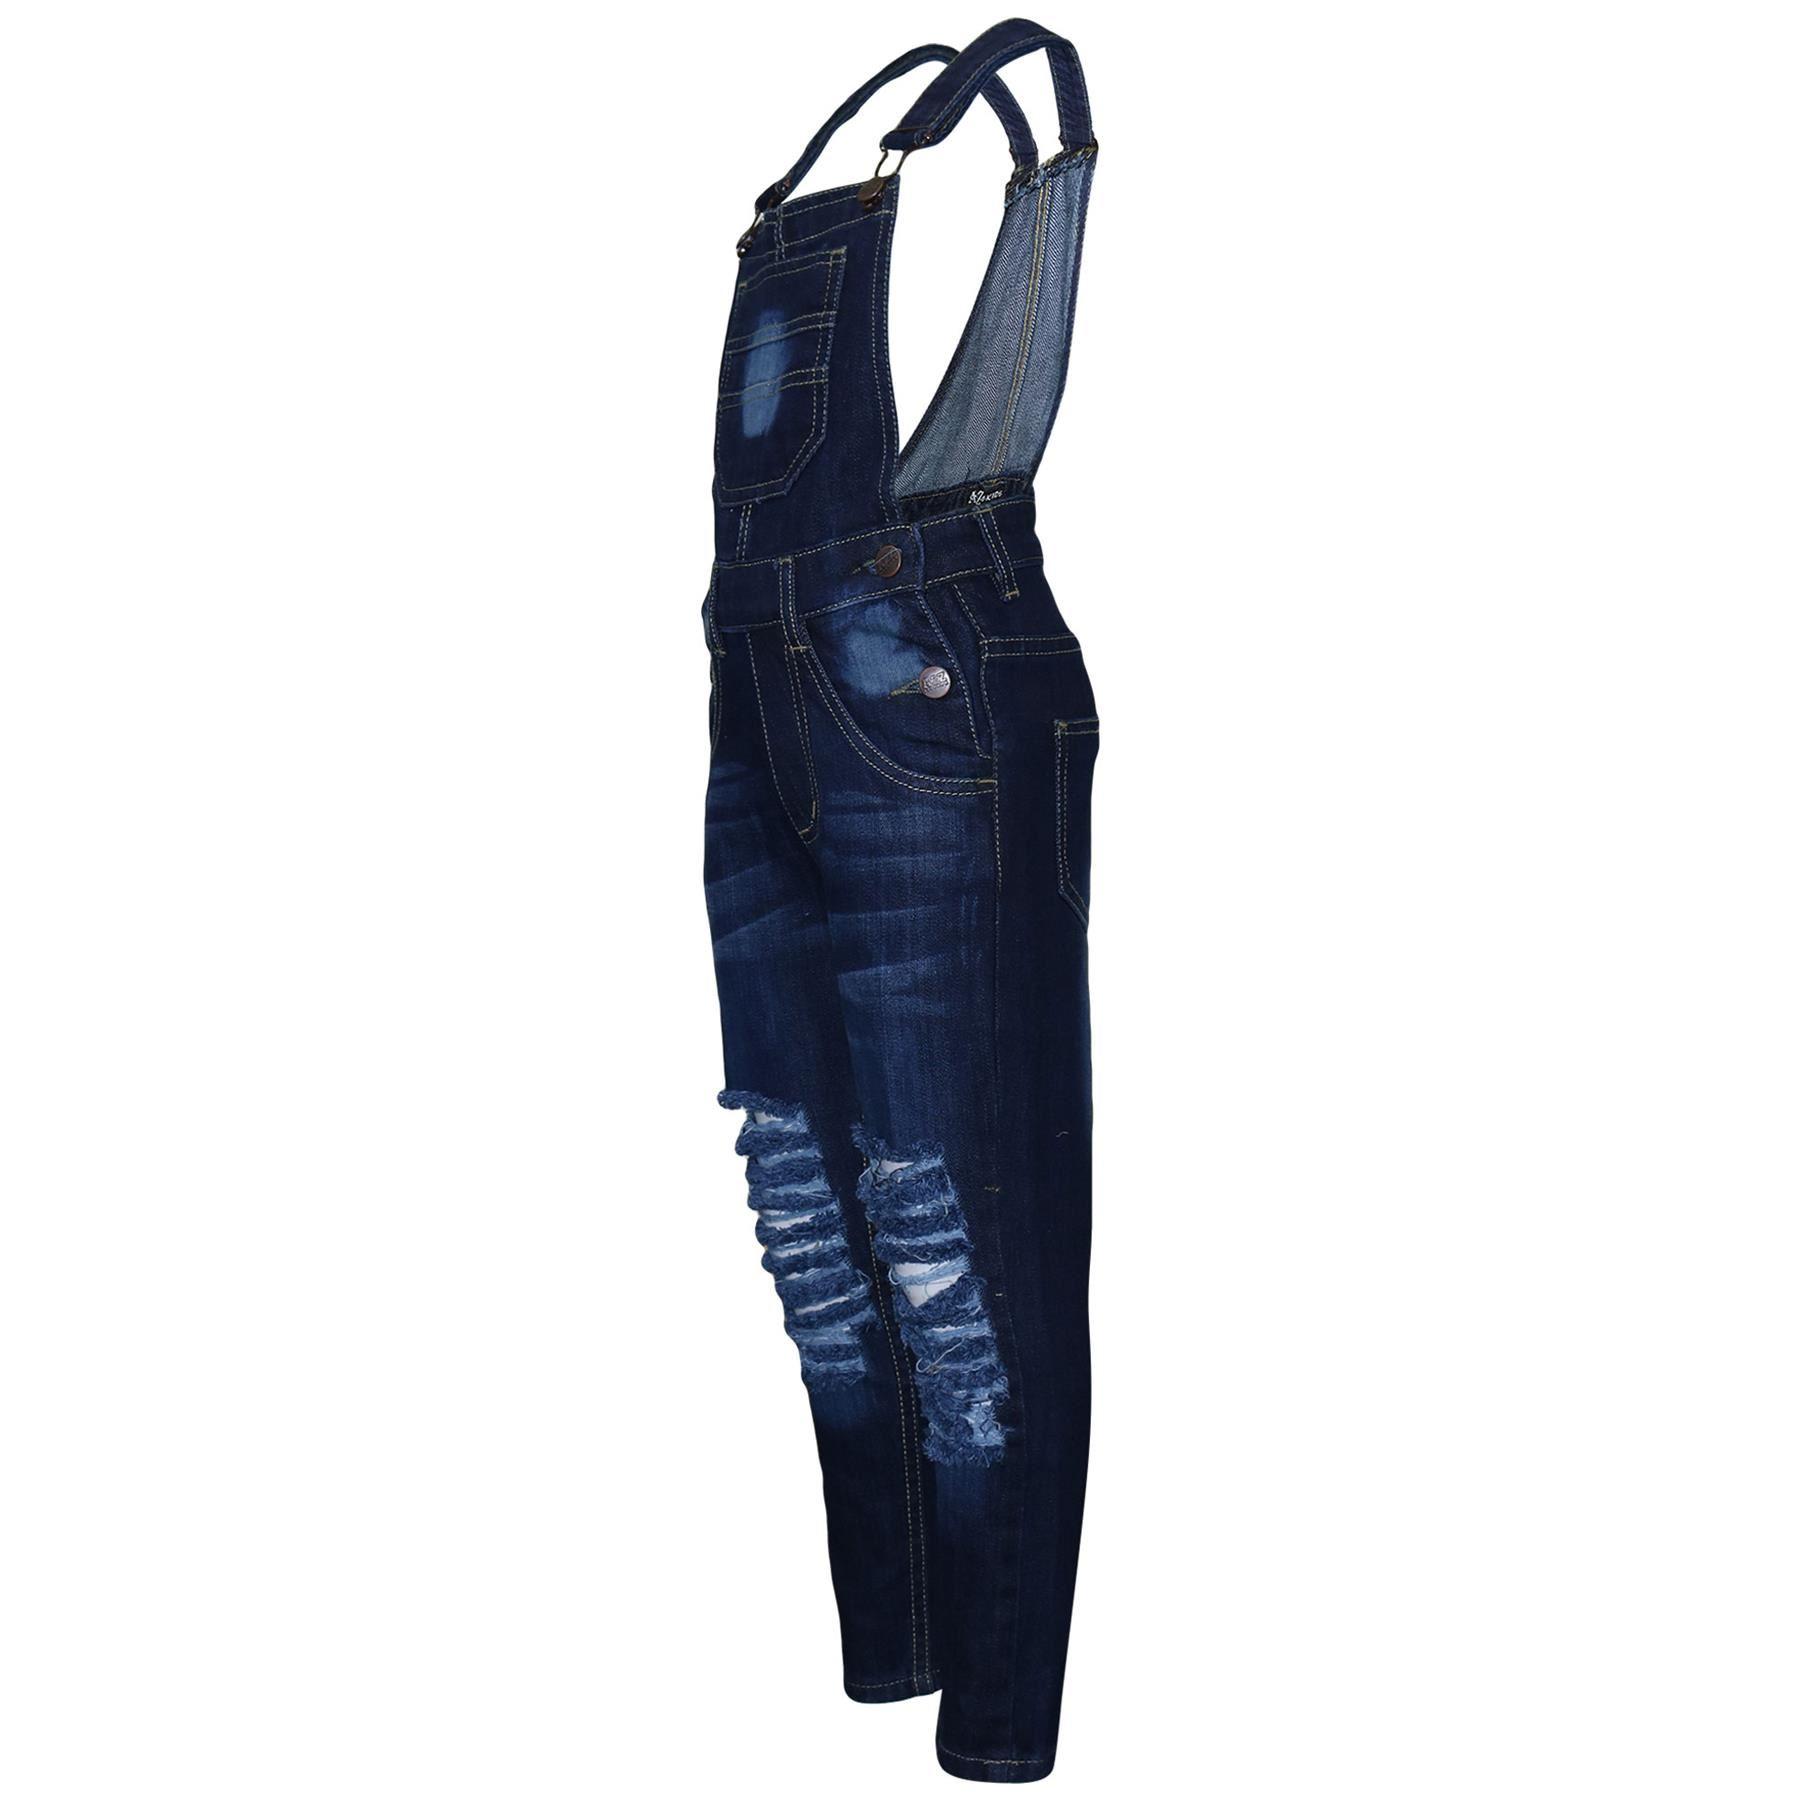 Indexbild 4 - Kinder Mädchen Denim Latzhose Zerrissen Dunkelblau Jeans Overall Mode 5-1